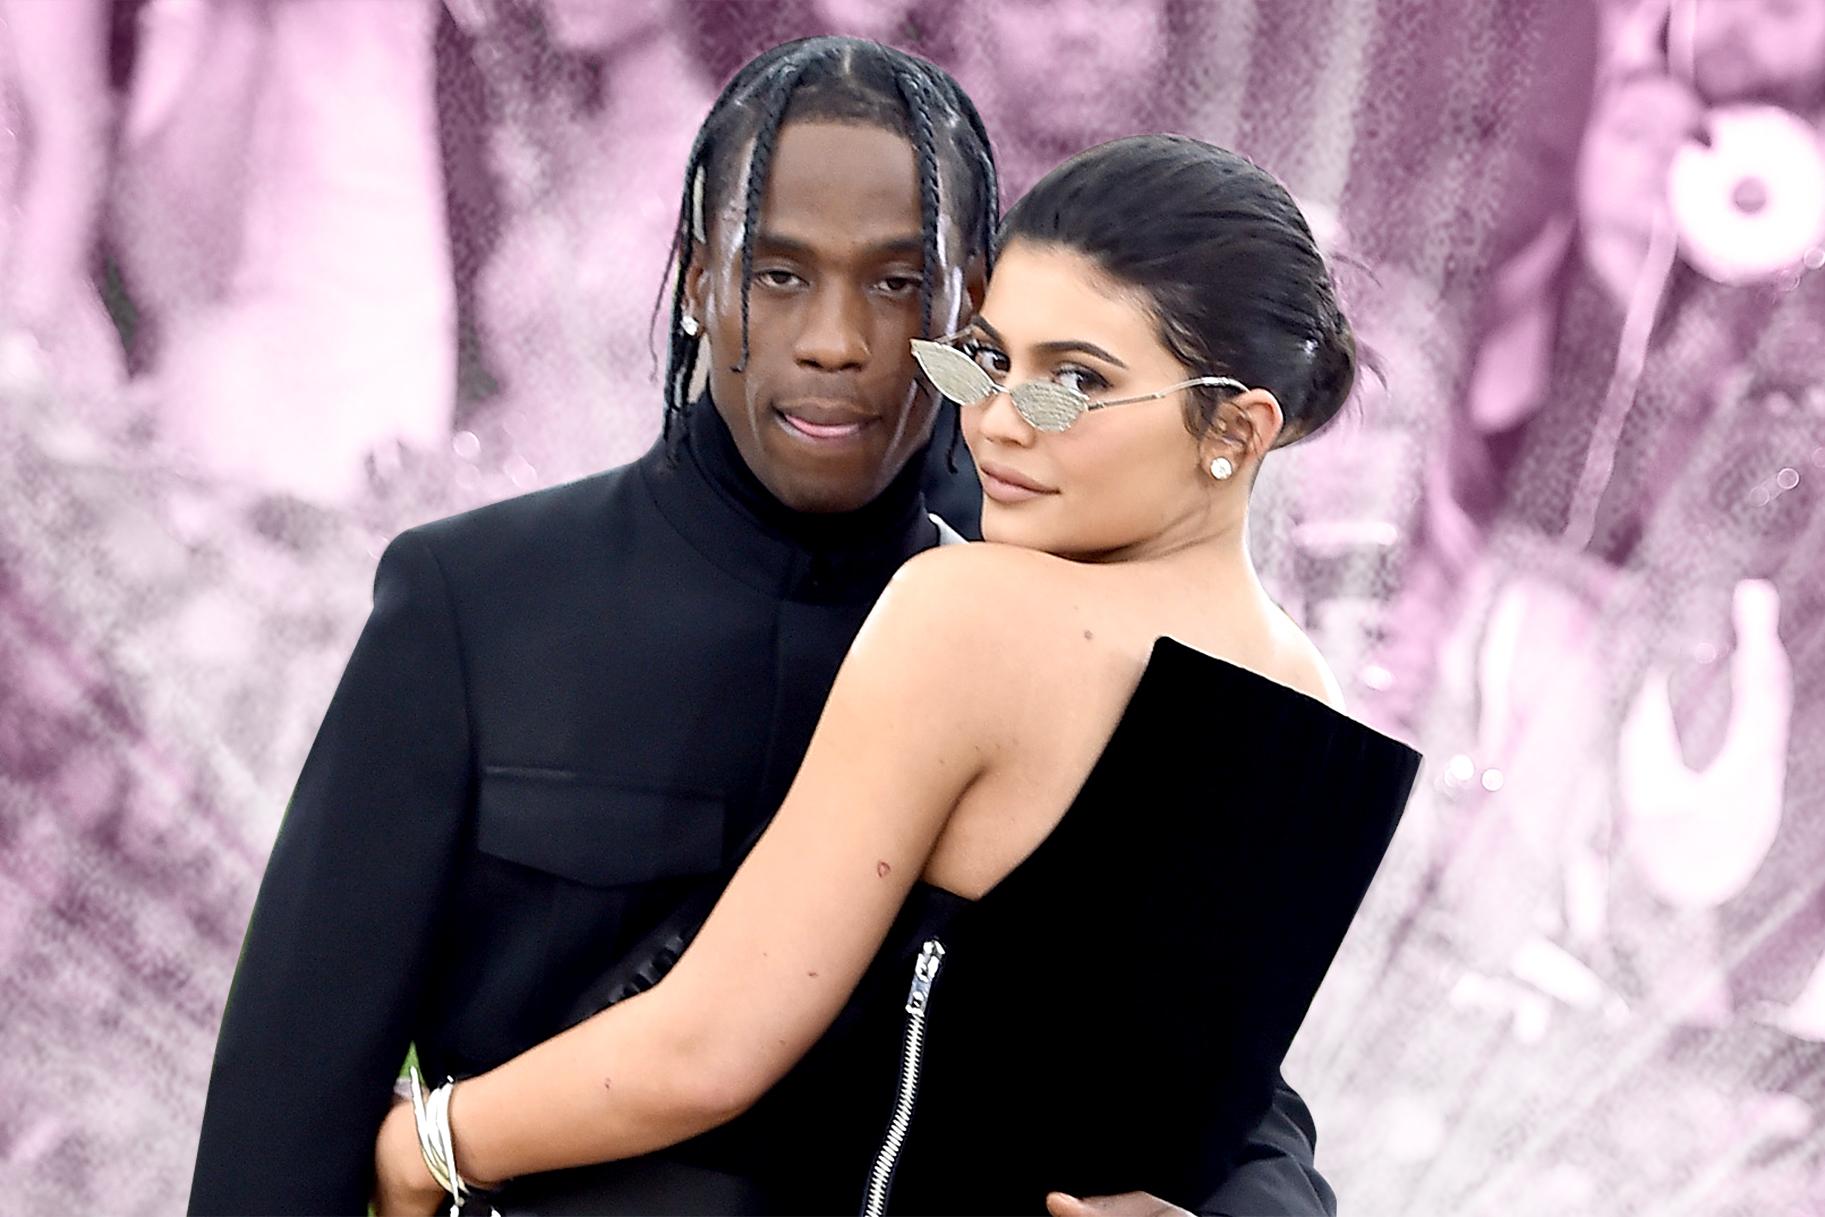 Kim and Kourtney Kardashian get physical in new 'KUWTK' trailer